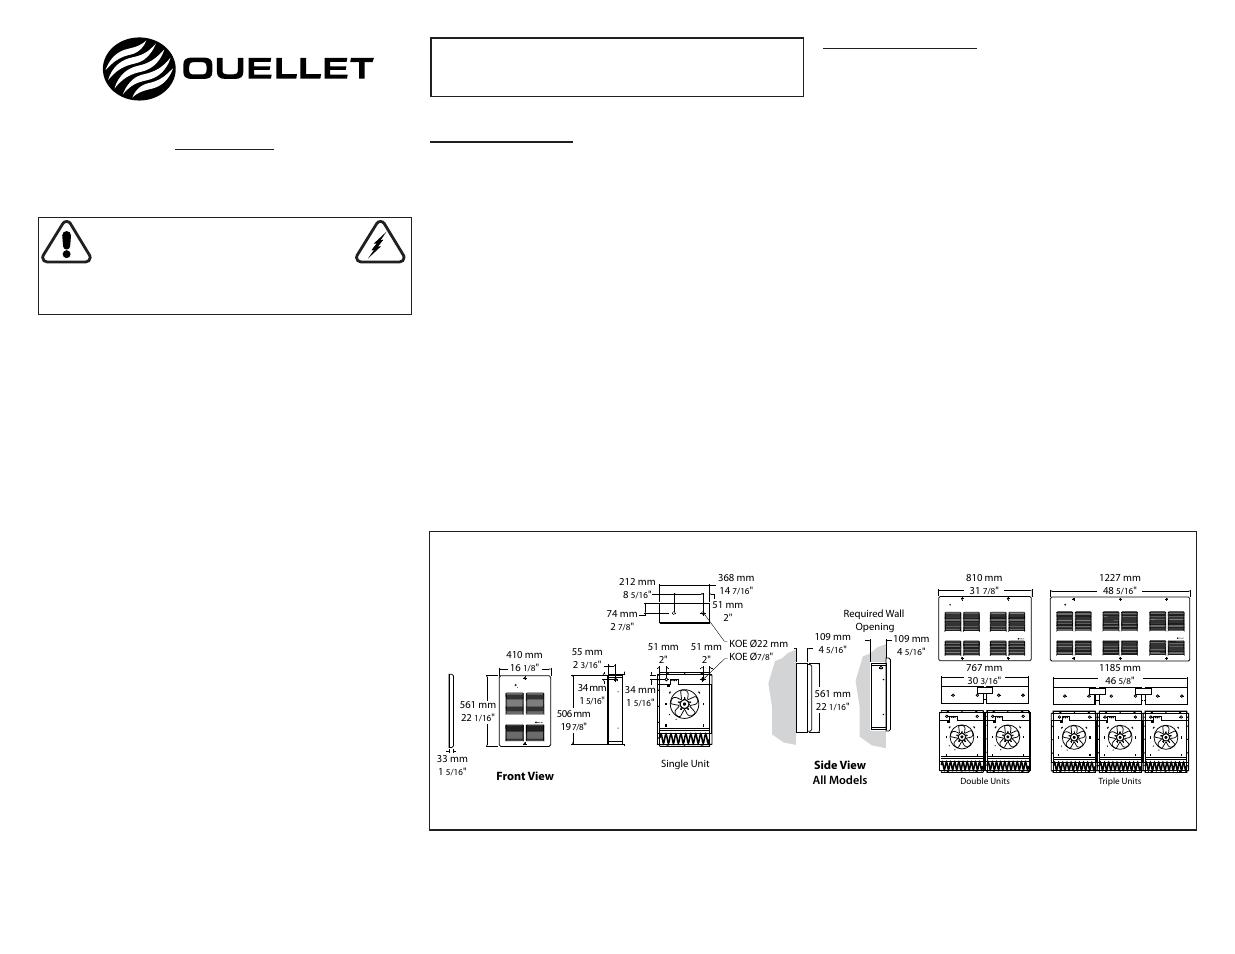 Ouellet Oac User Manual